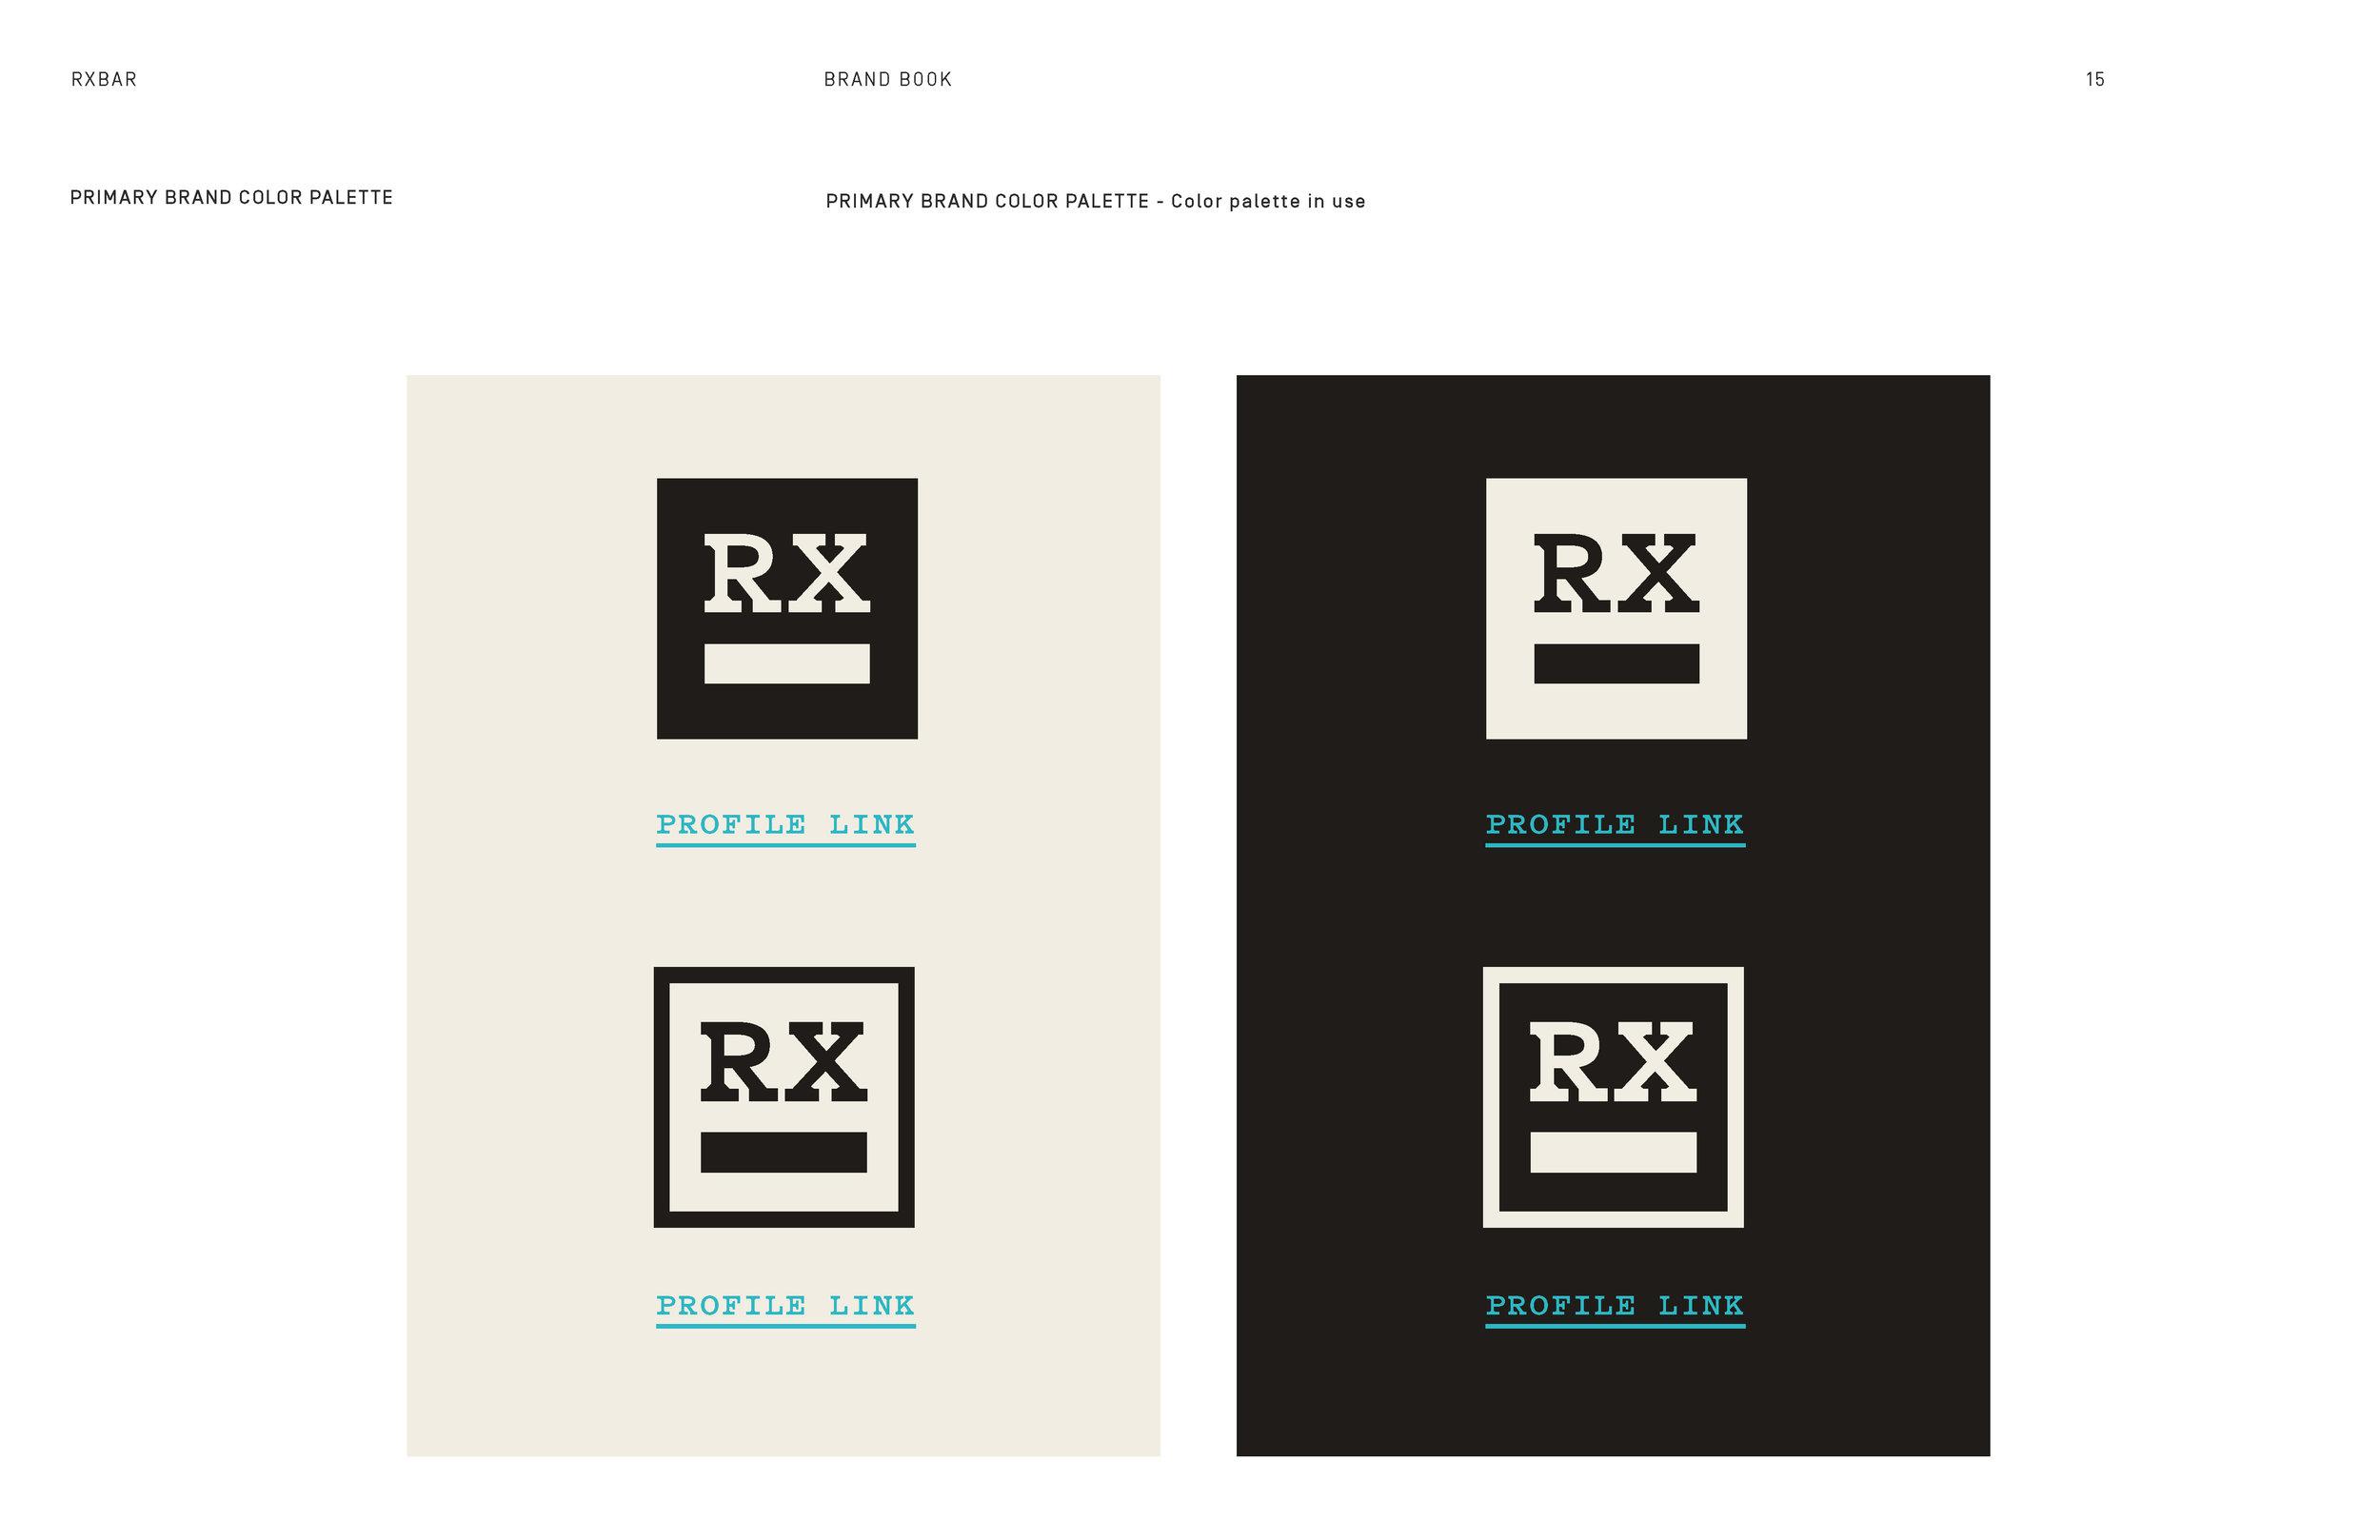 RXBAR_Brand guide_mwf_Page_15.jpg